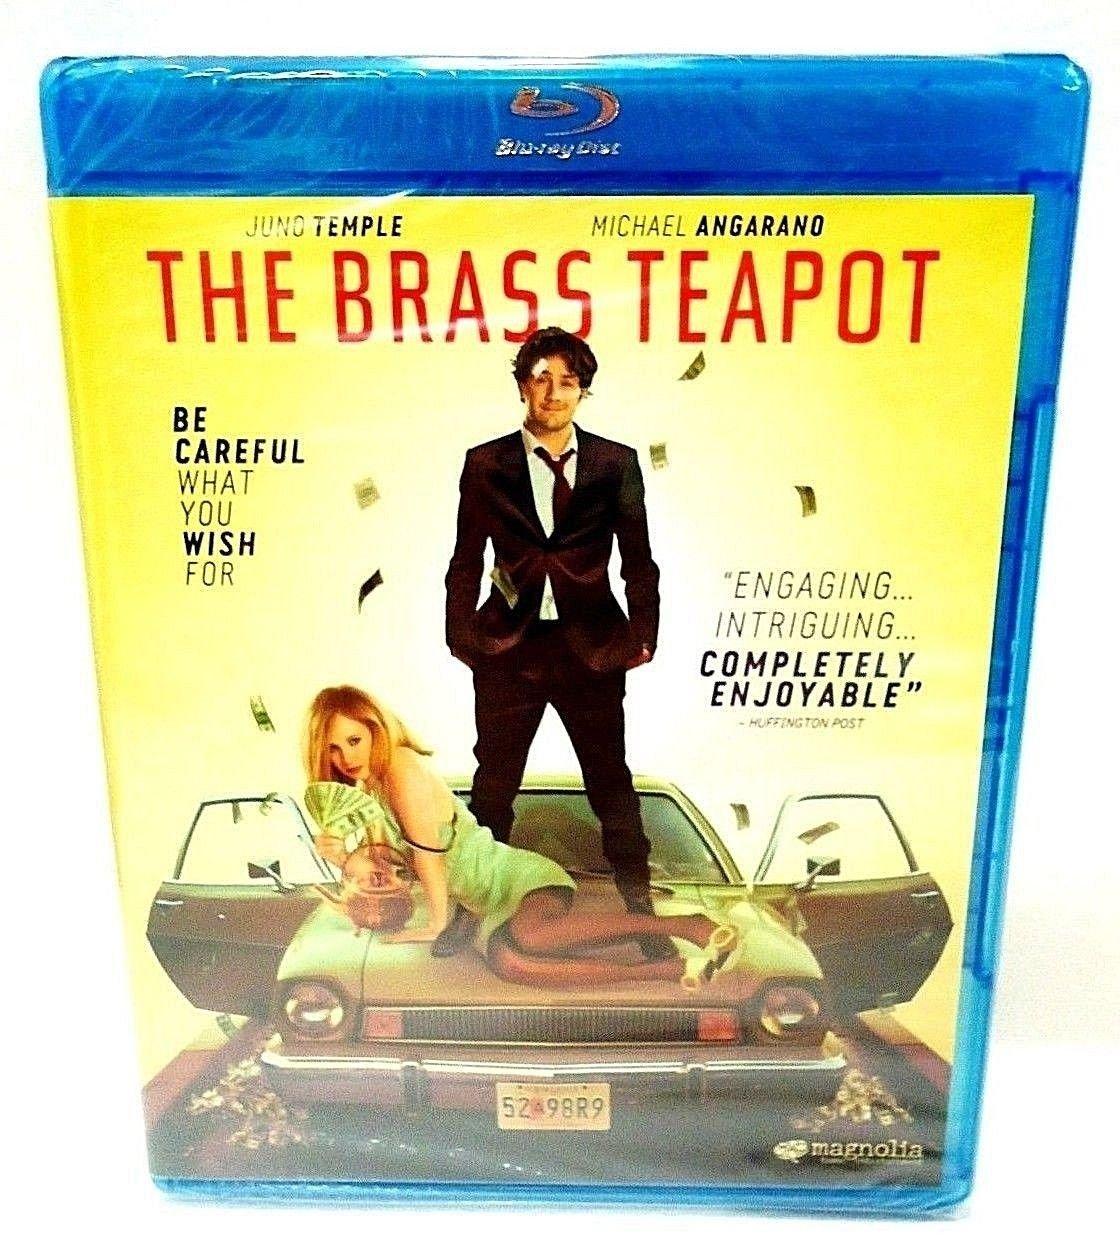 THE BRASS TEAPOT - BLU-RAY - DVD - JUNO TEMPLE - BRAND NEW - COMEDY - MOVIE